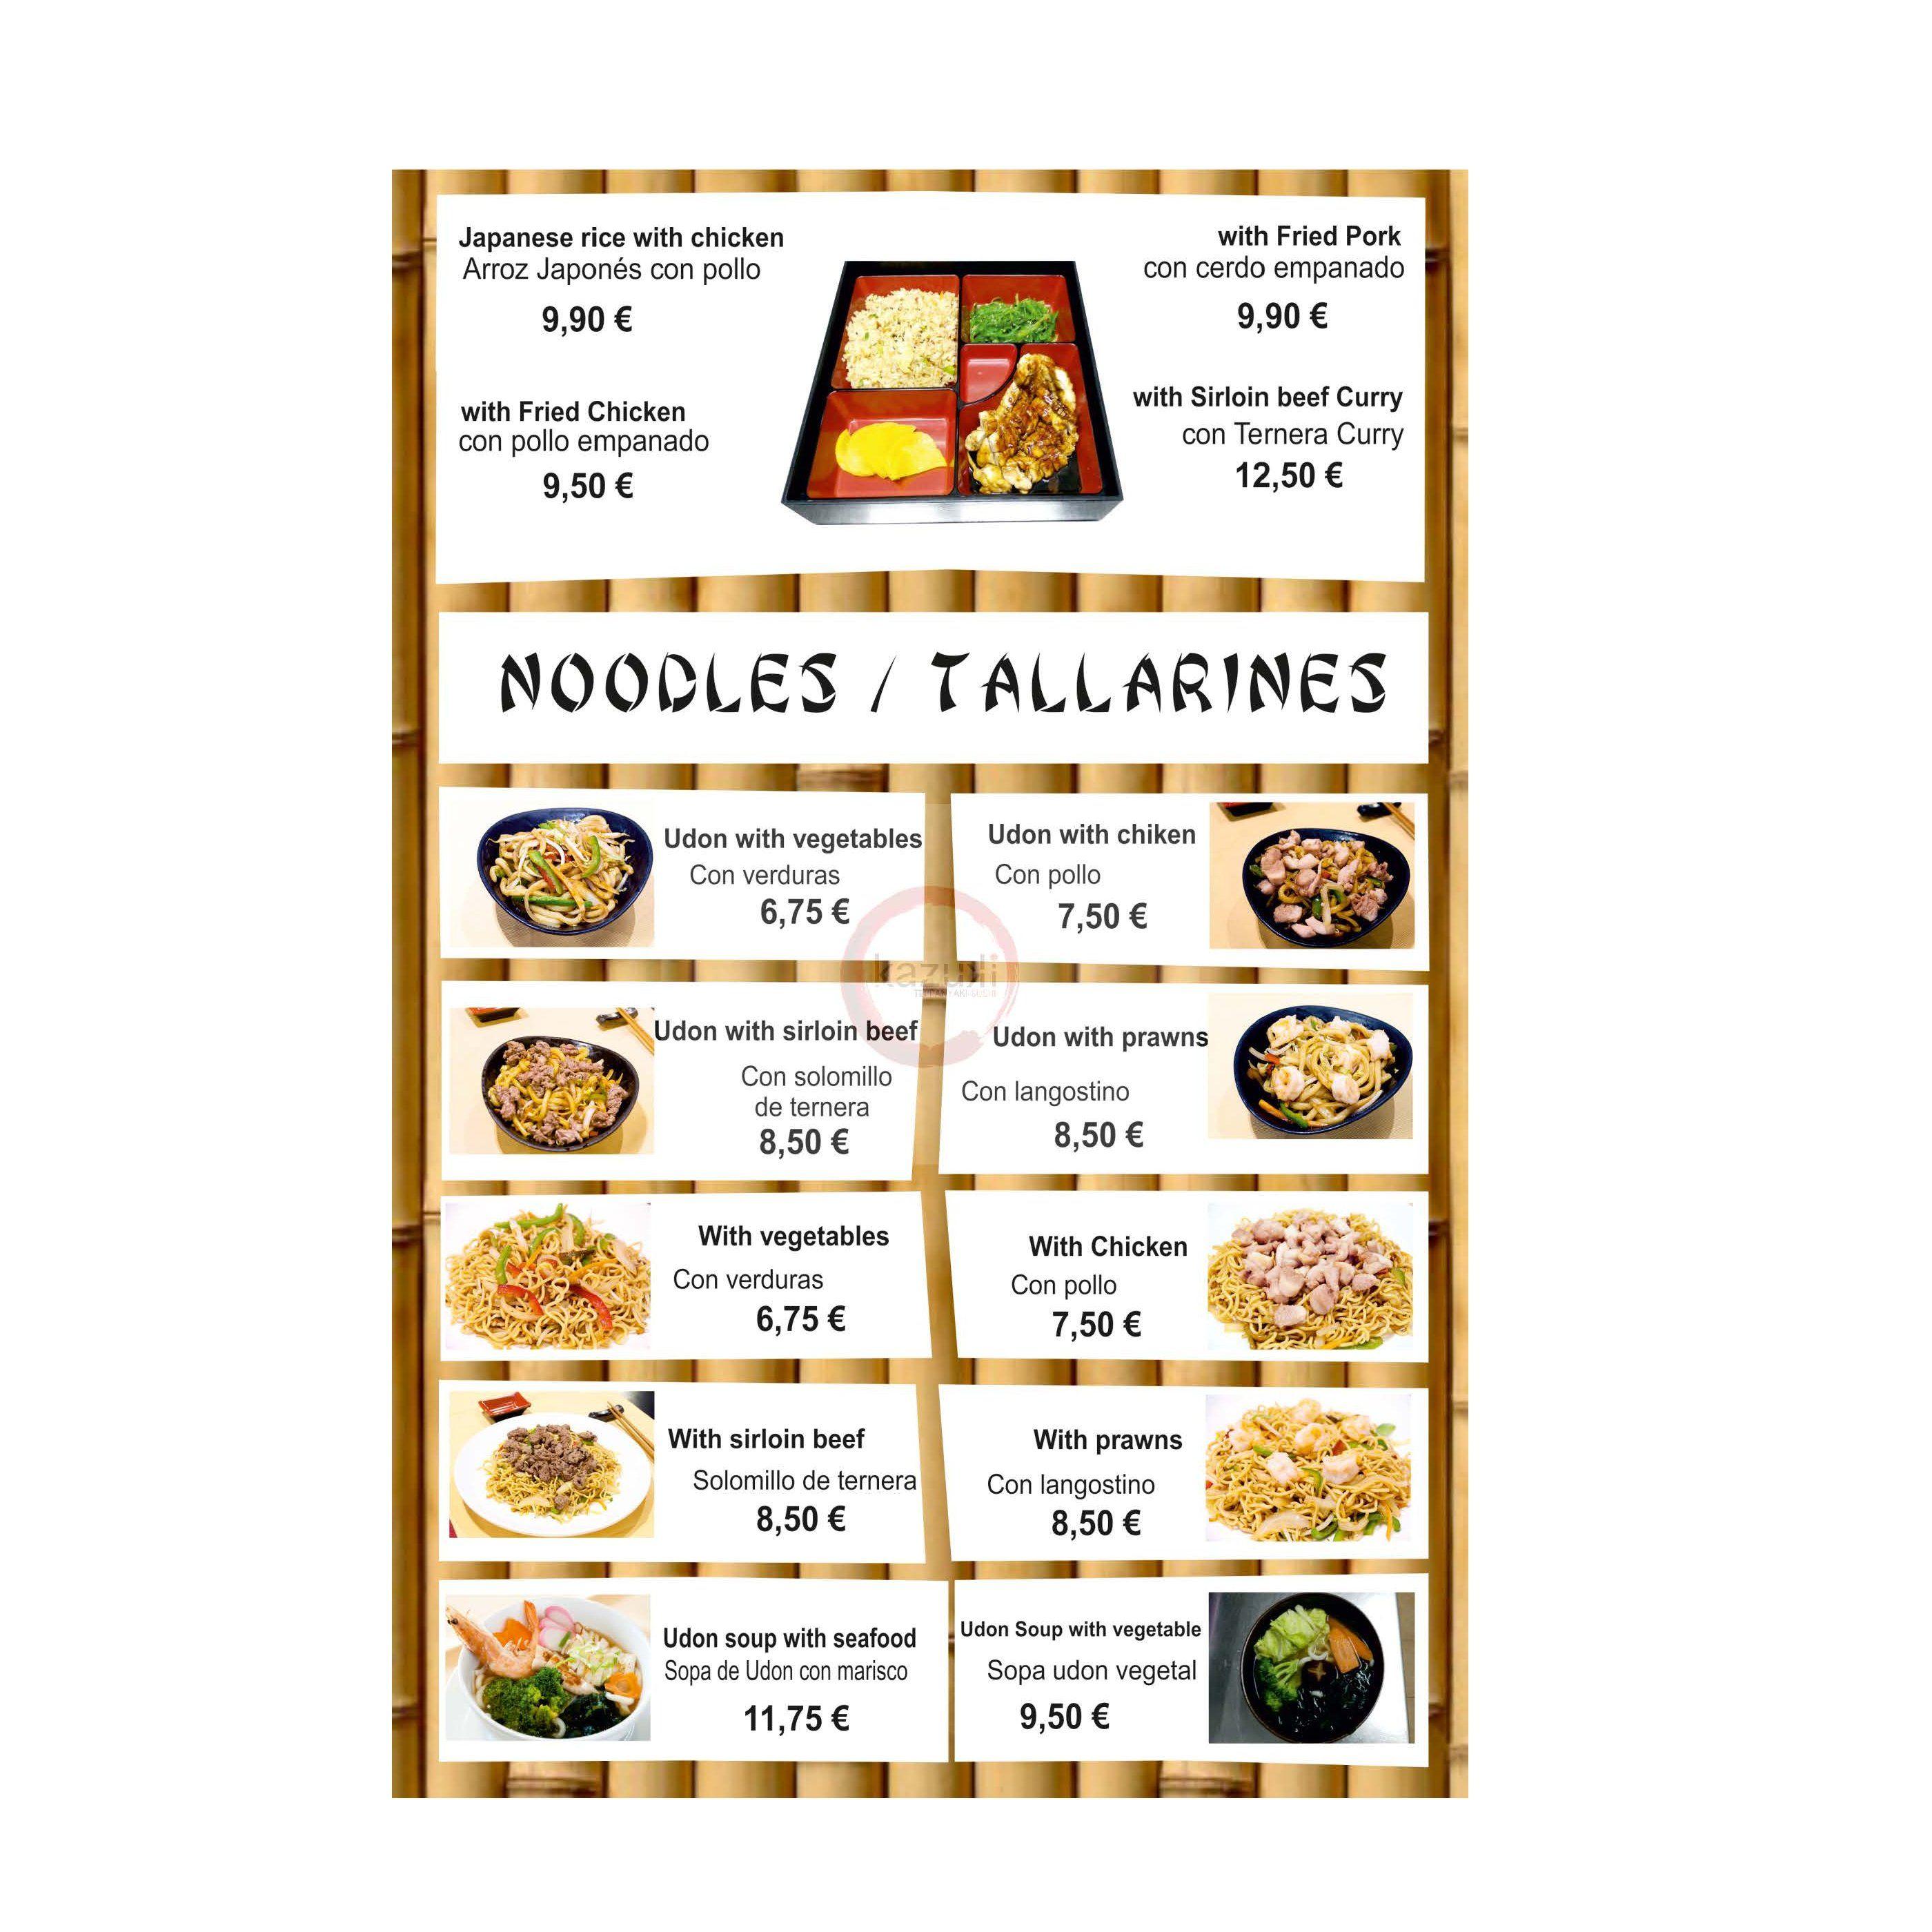 Noodles / Tallarines